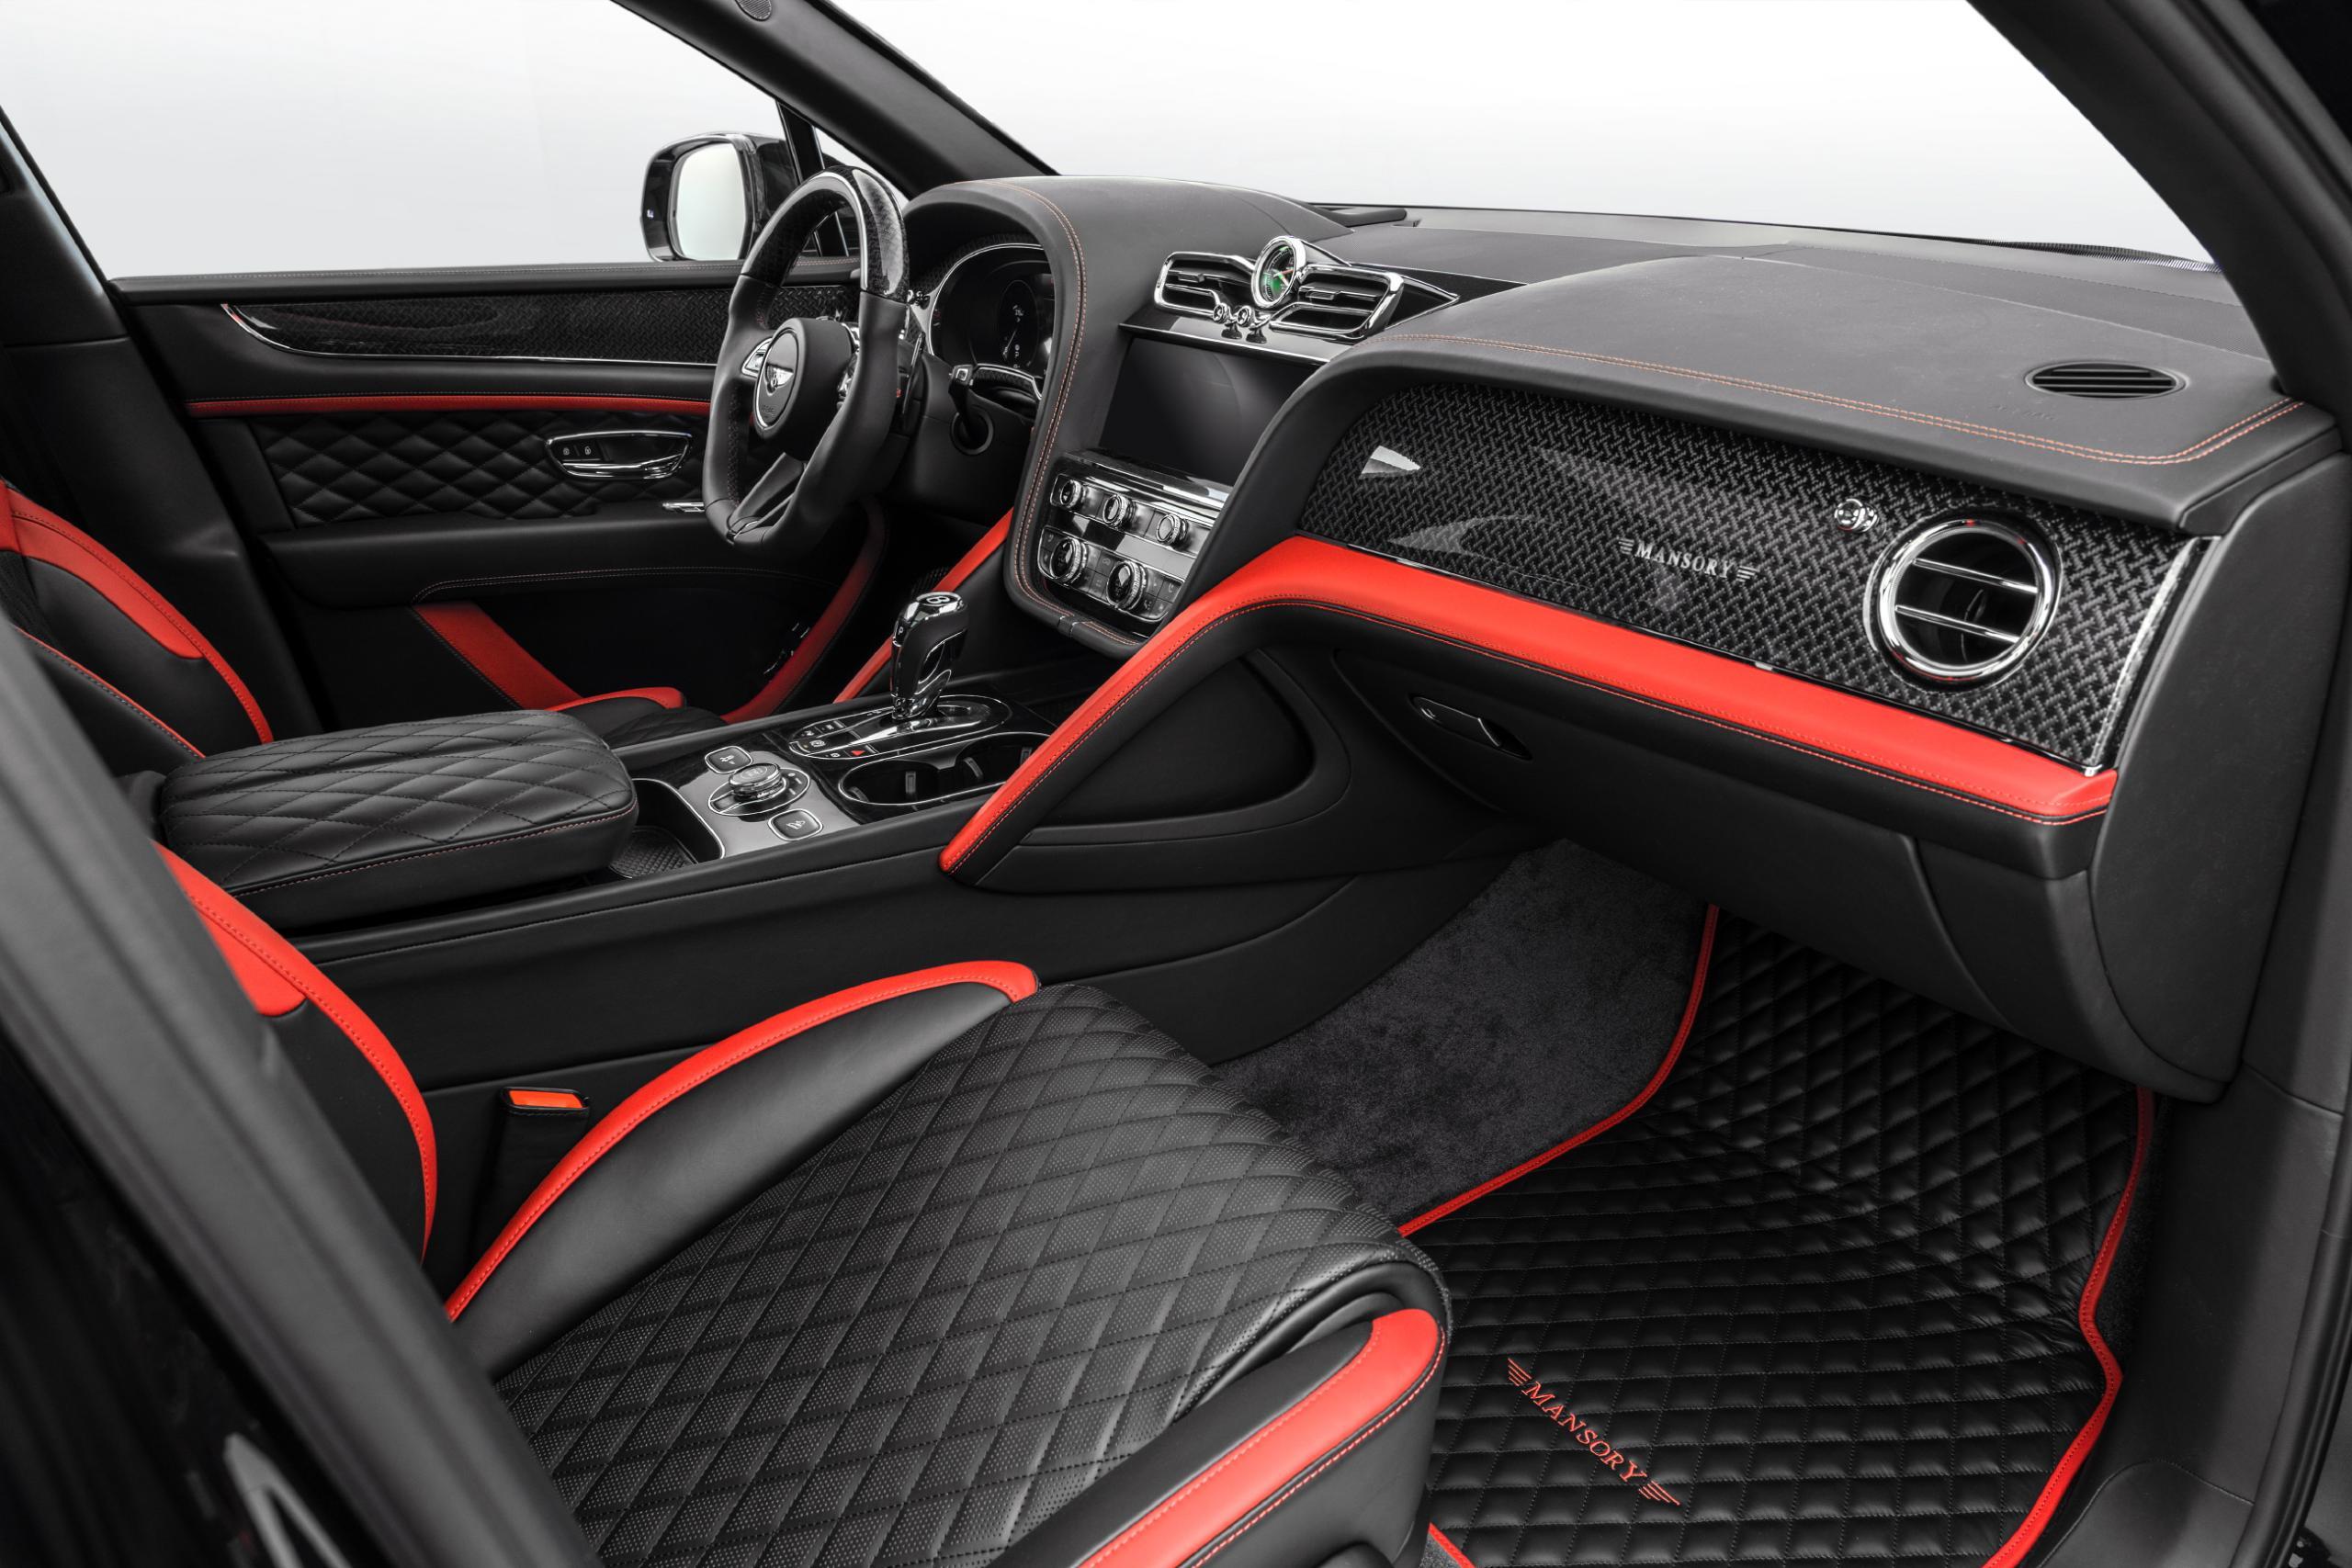 mansory new bentayga wide body kit carbon fiber bespoke leather interior 2021